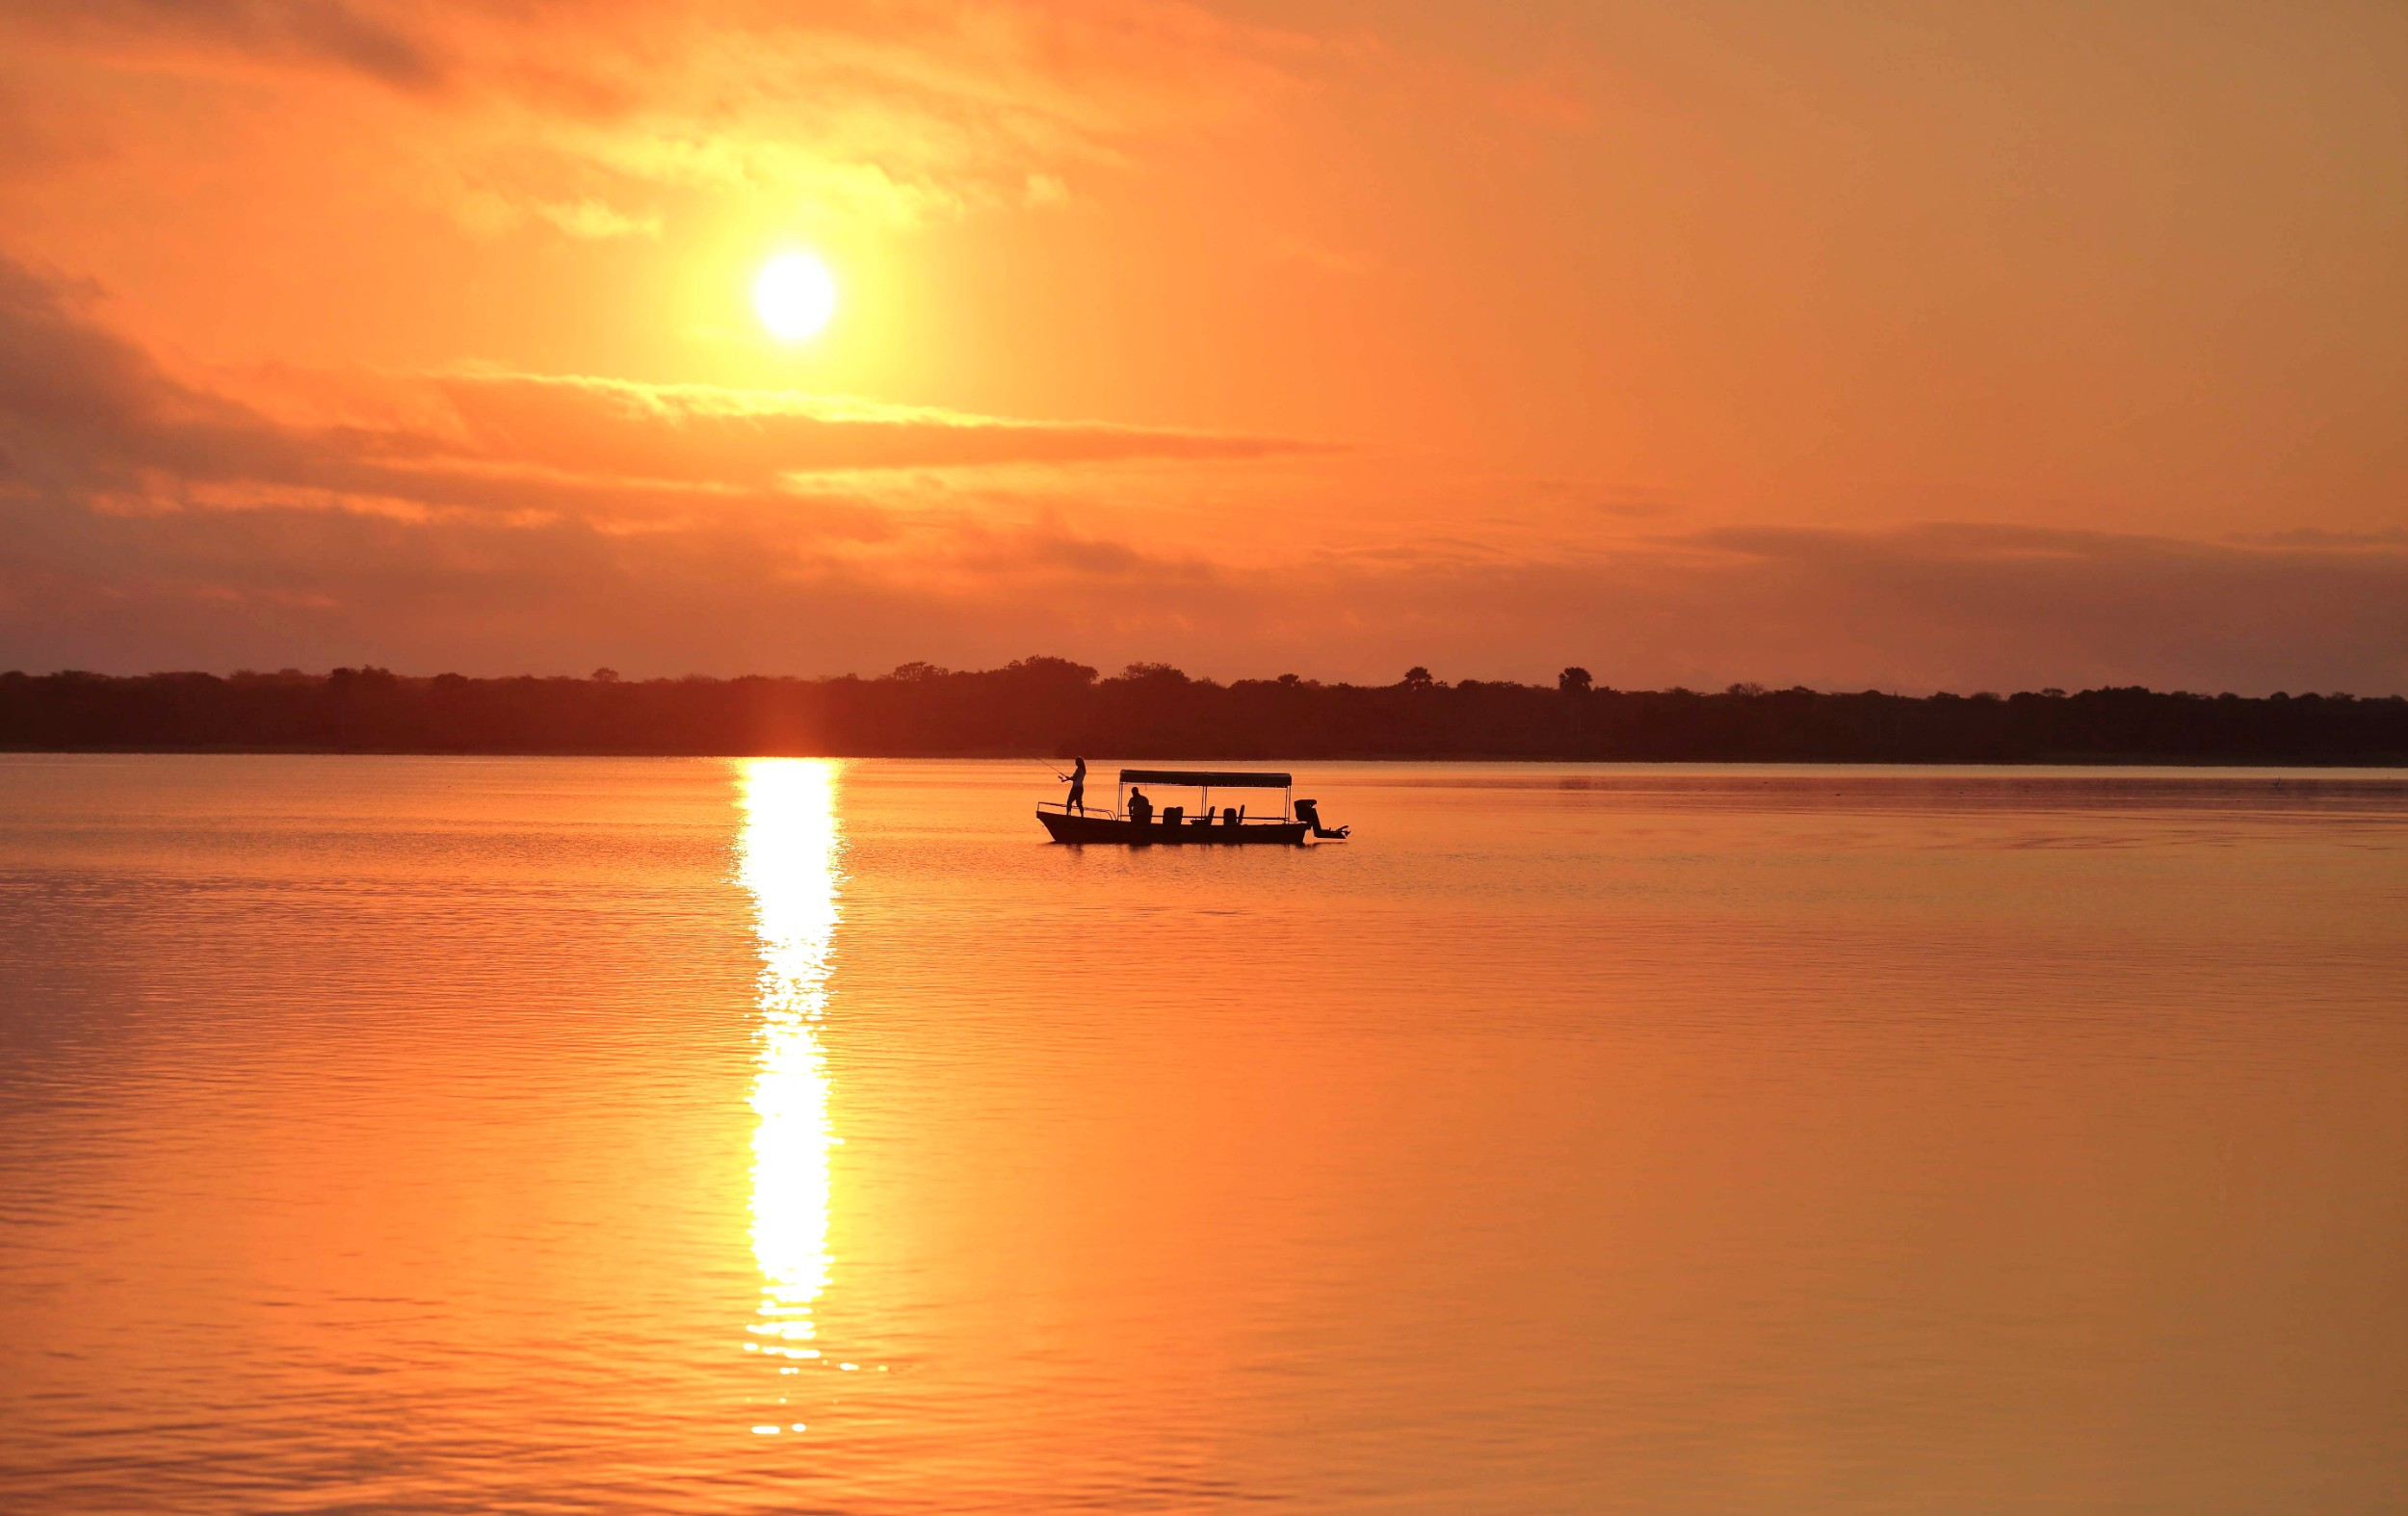 Fishing-at-sunrise-Roho.jpg